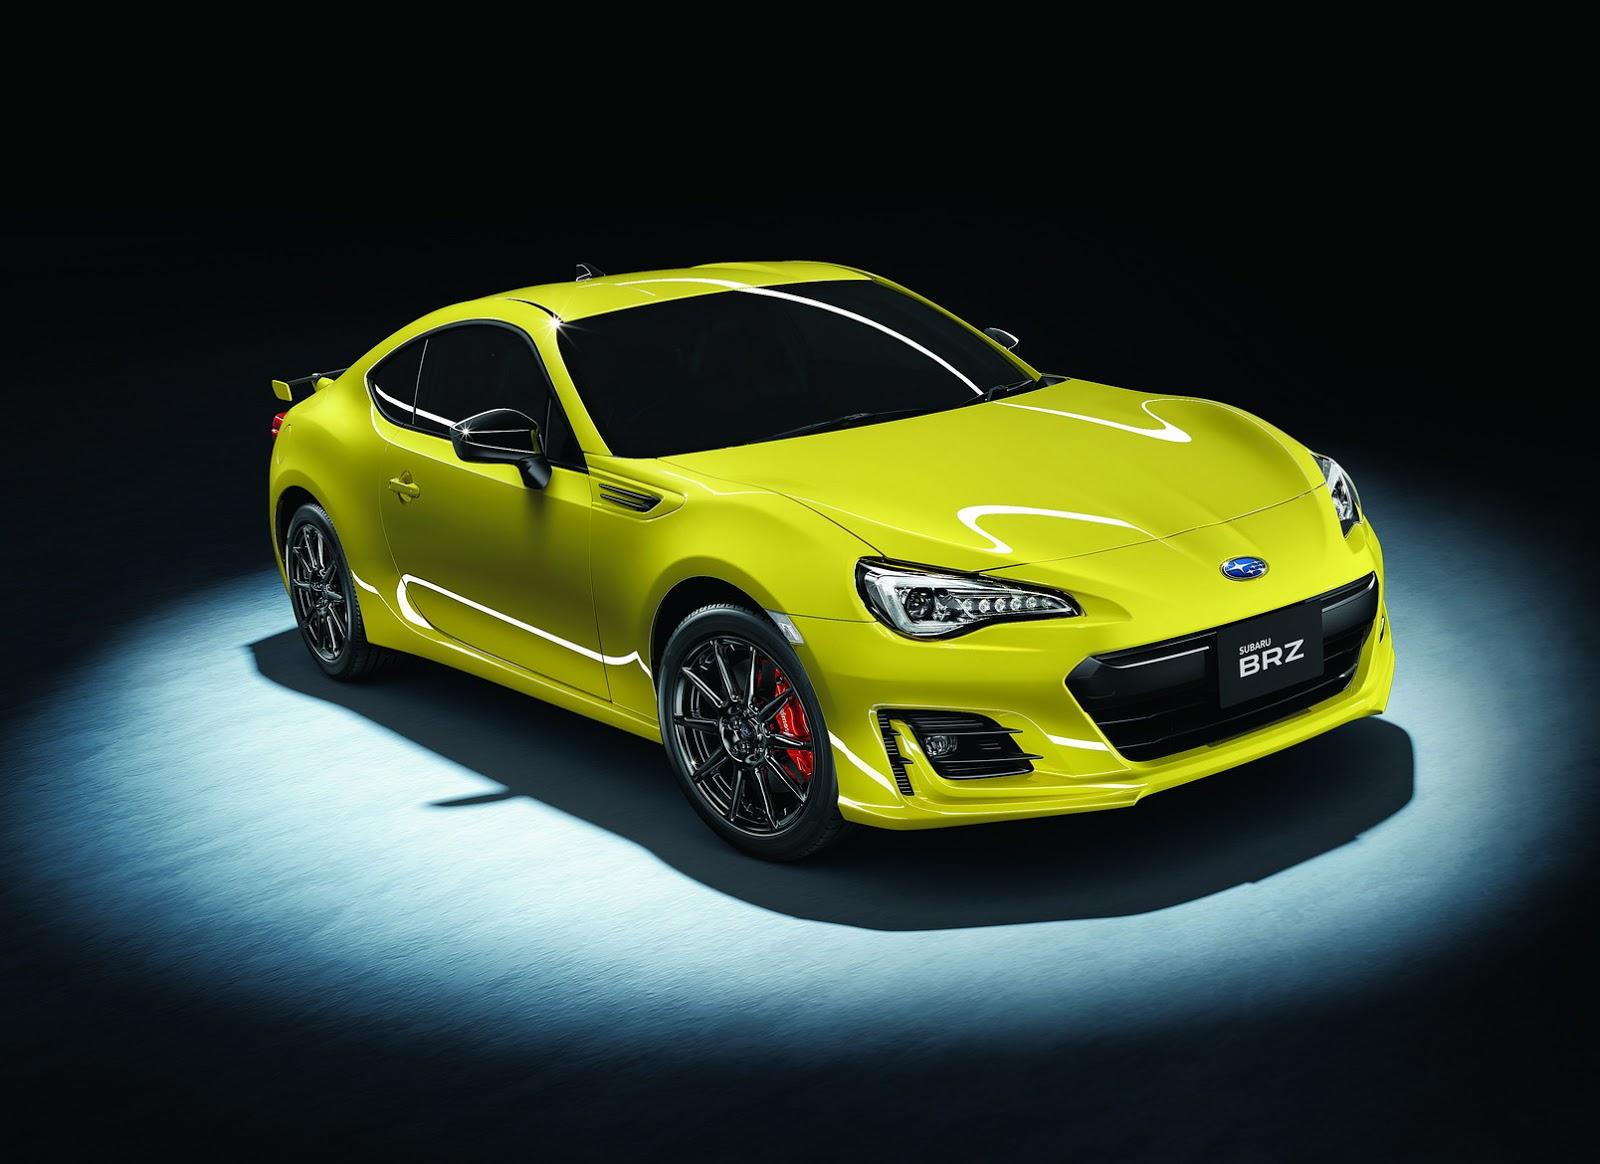 Japan Gets 2017 Subaru Brz Gt Range Topper Carscoops Com